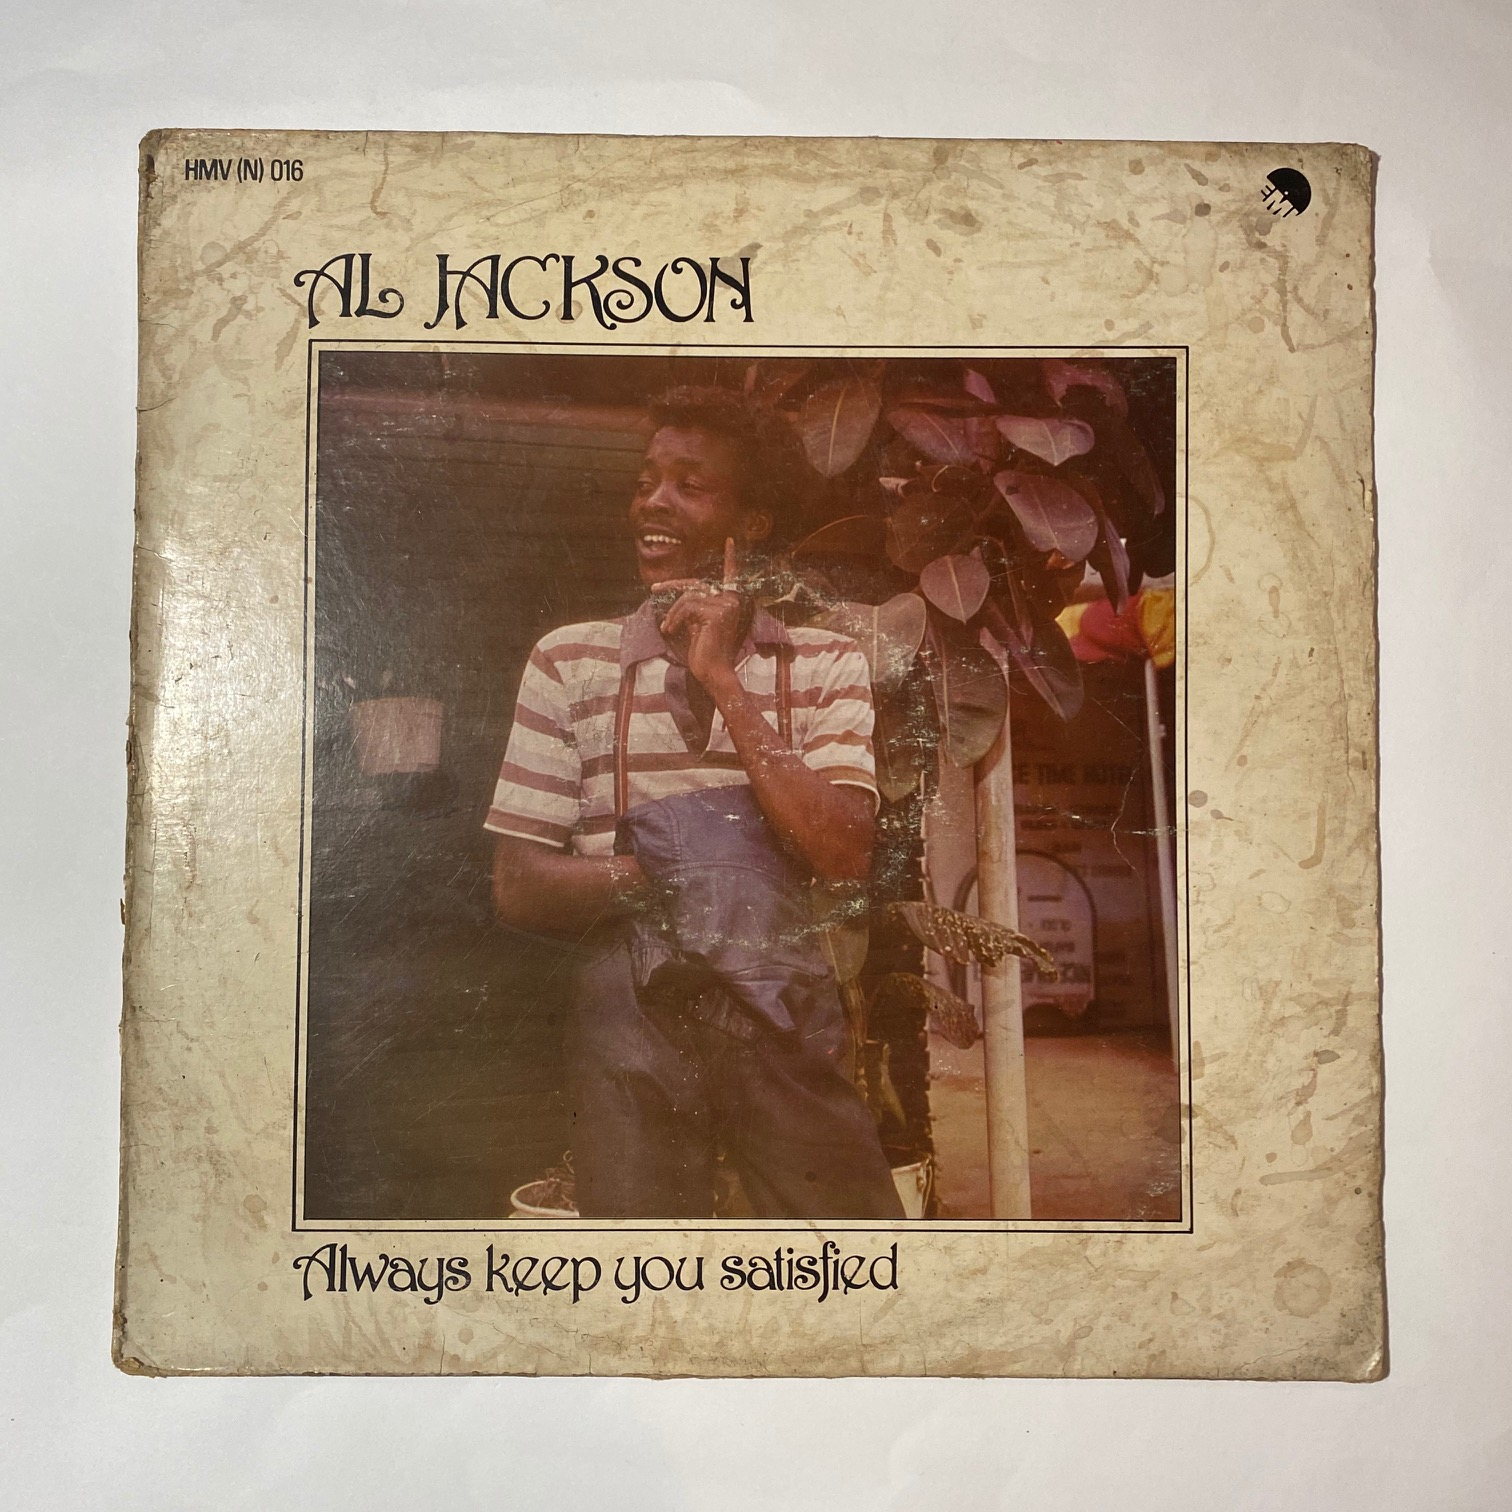 AL JACKSON - Always keep you satisfied - 33T